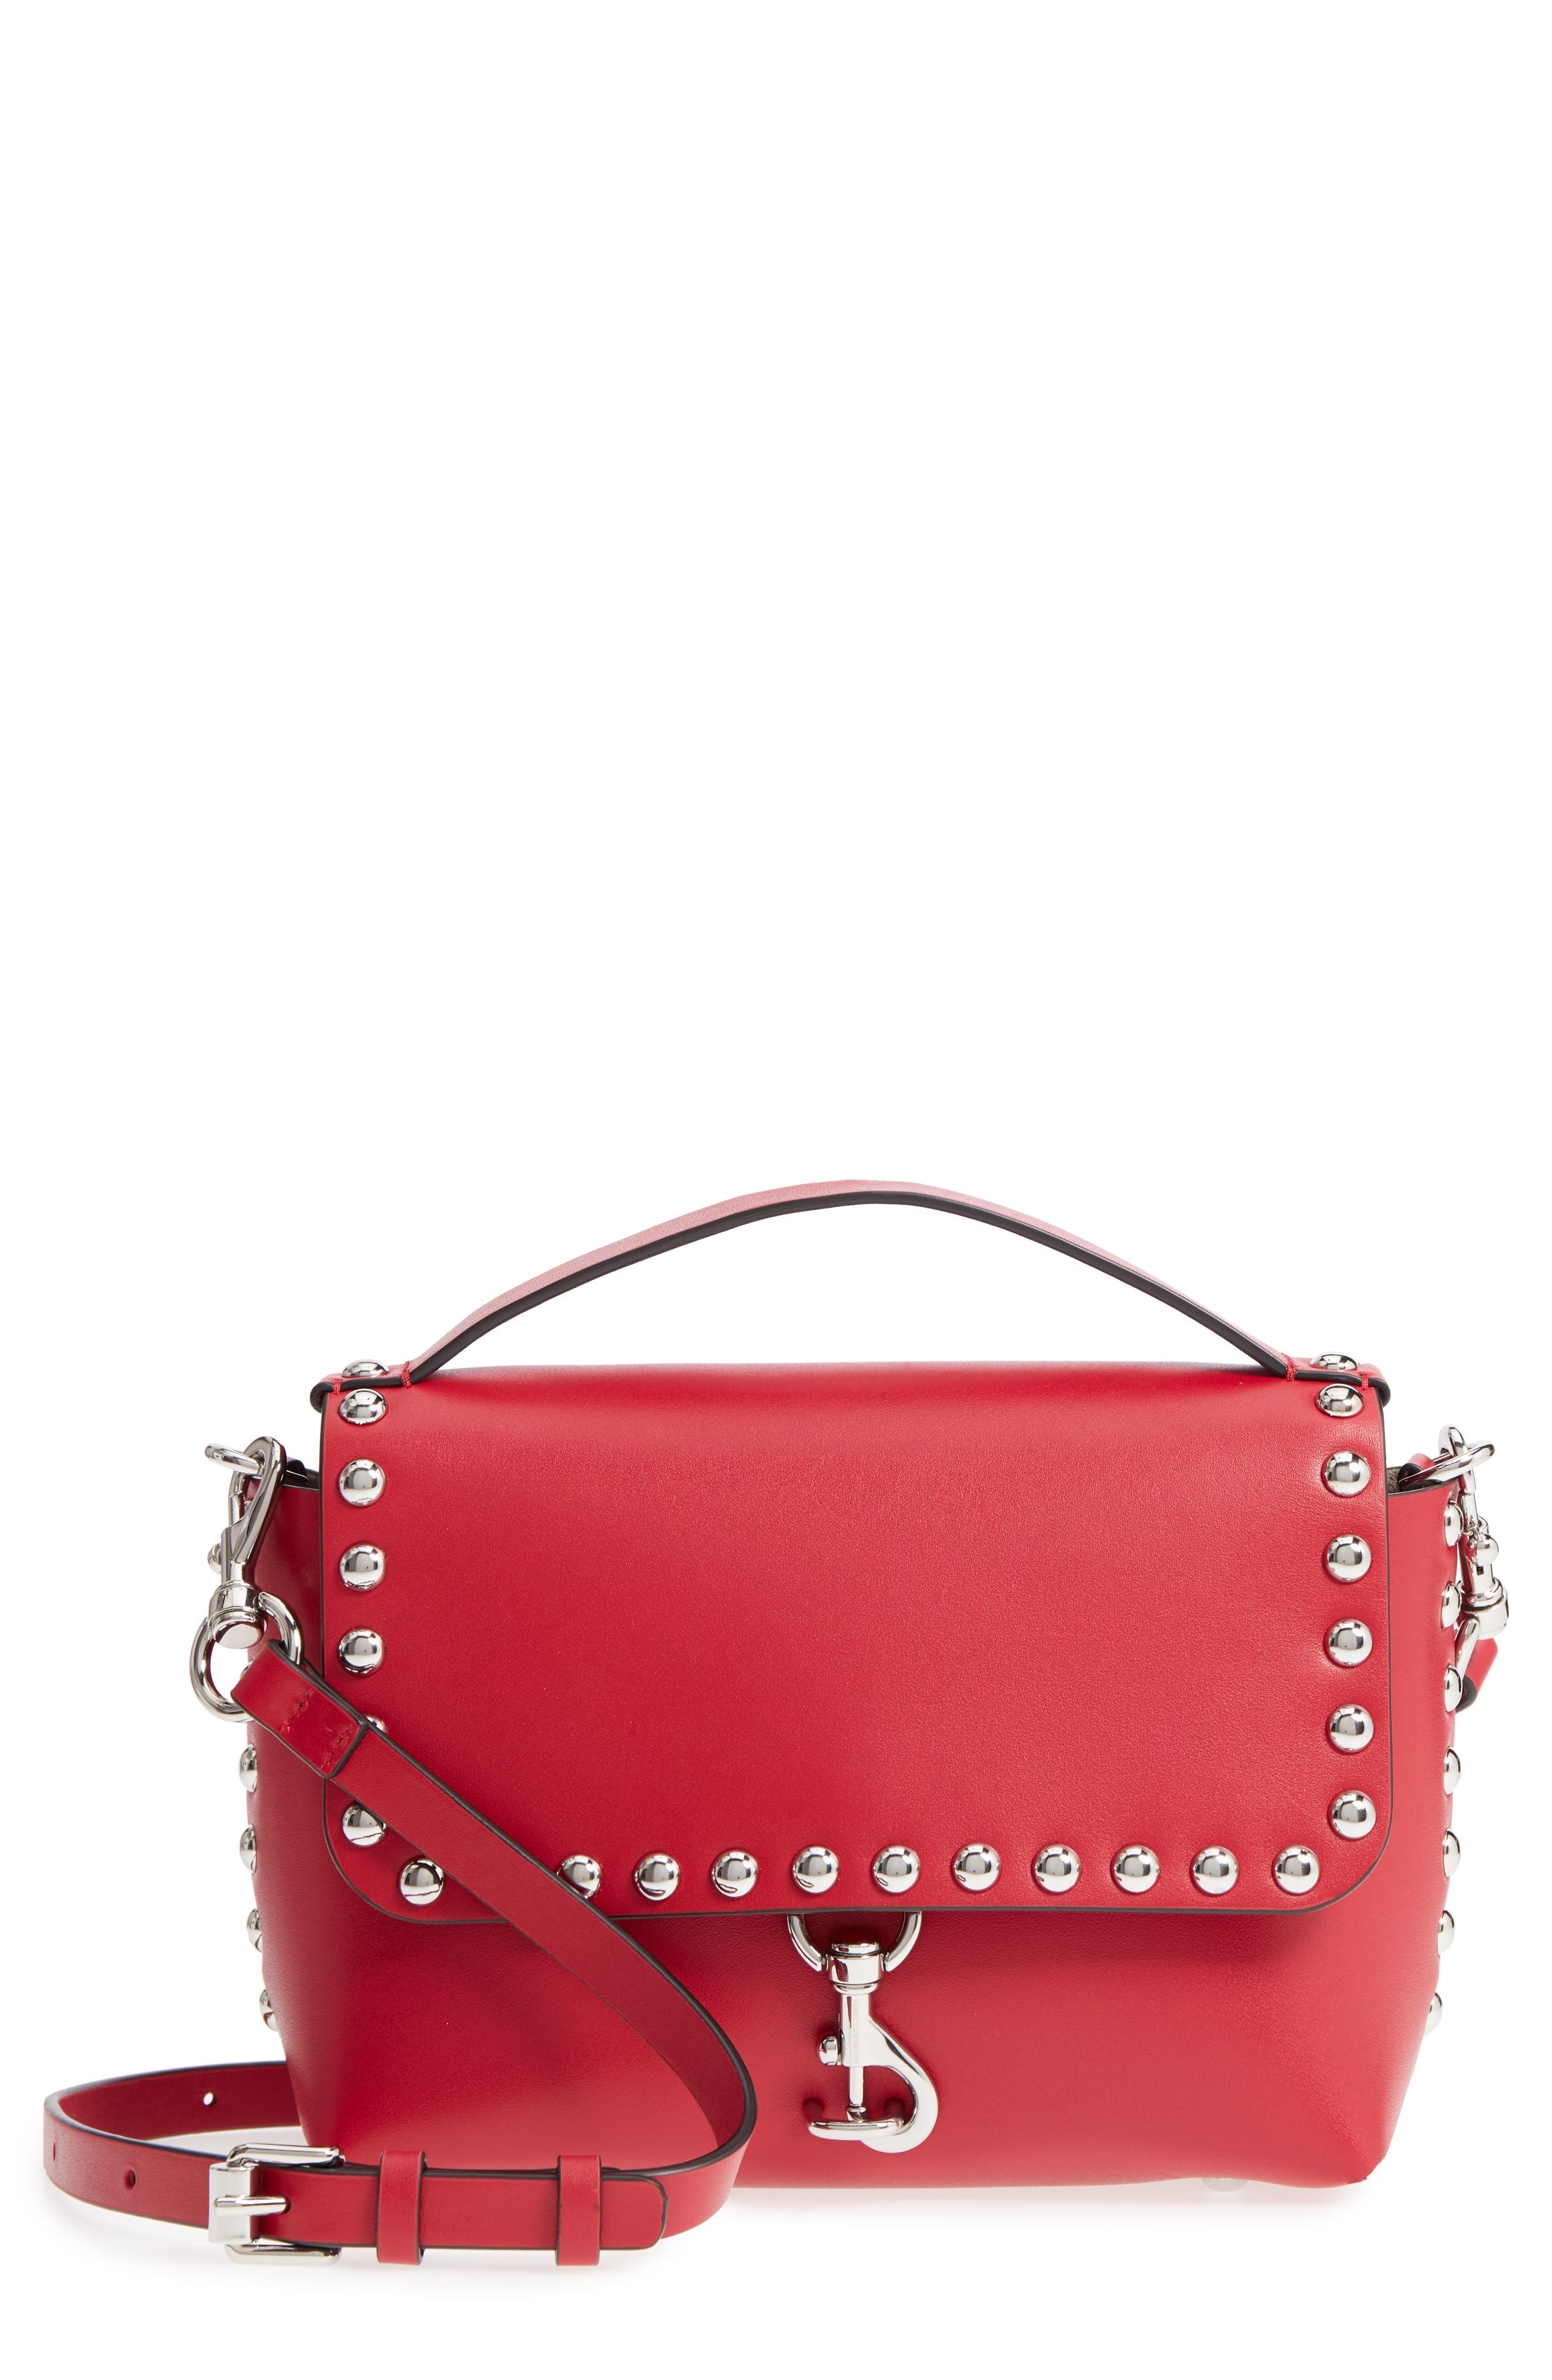 Rebecca Minkoff Blythe Medium Studded Leather Crossbody Bag